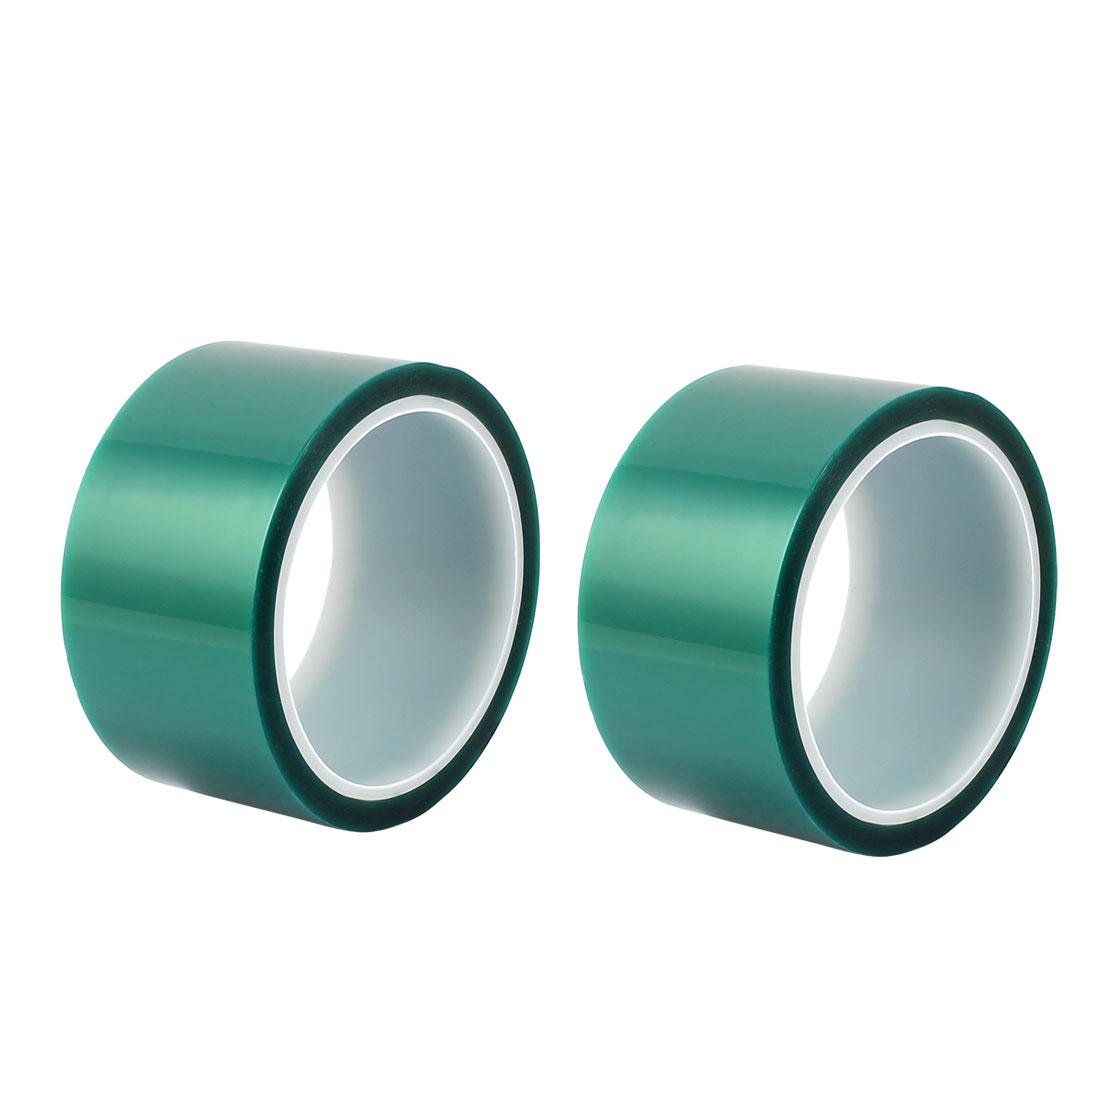 2pcs 50mm Width 33M Long Green PET High Temperature Heat Resistant PCB Solder Tape